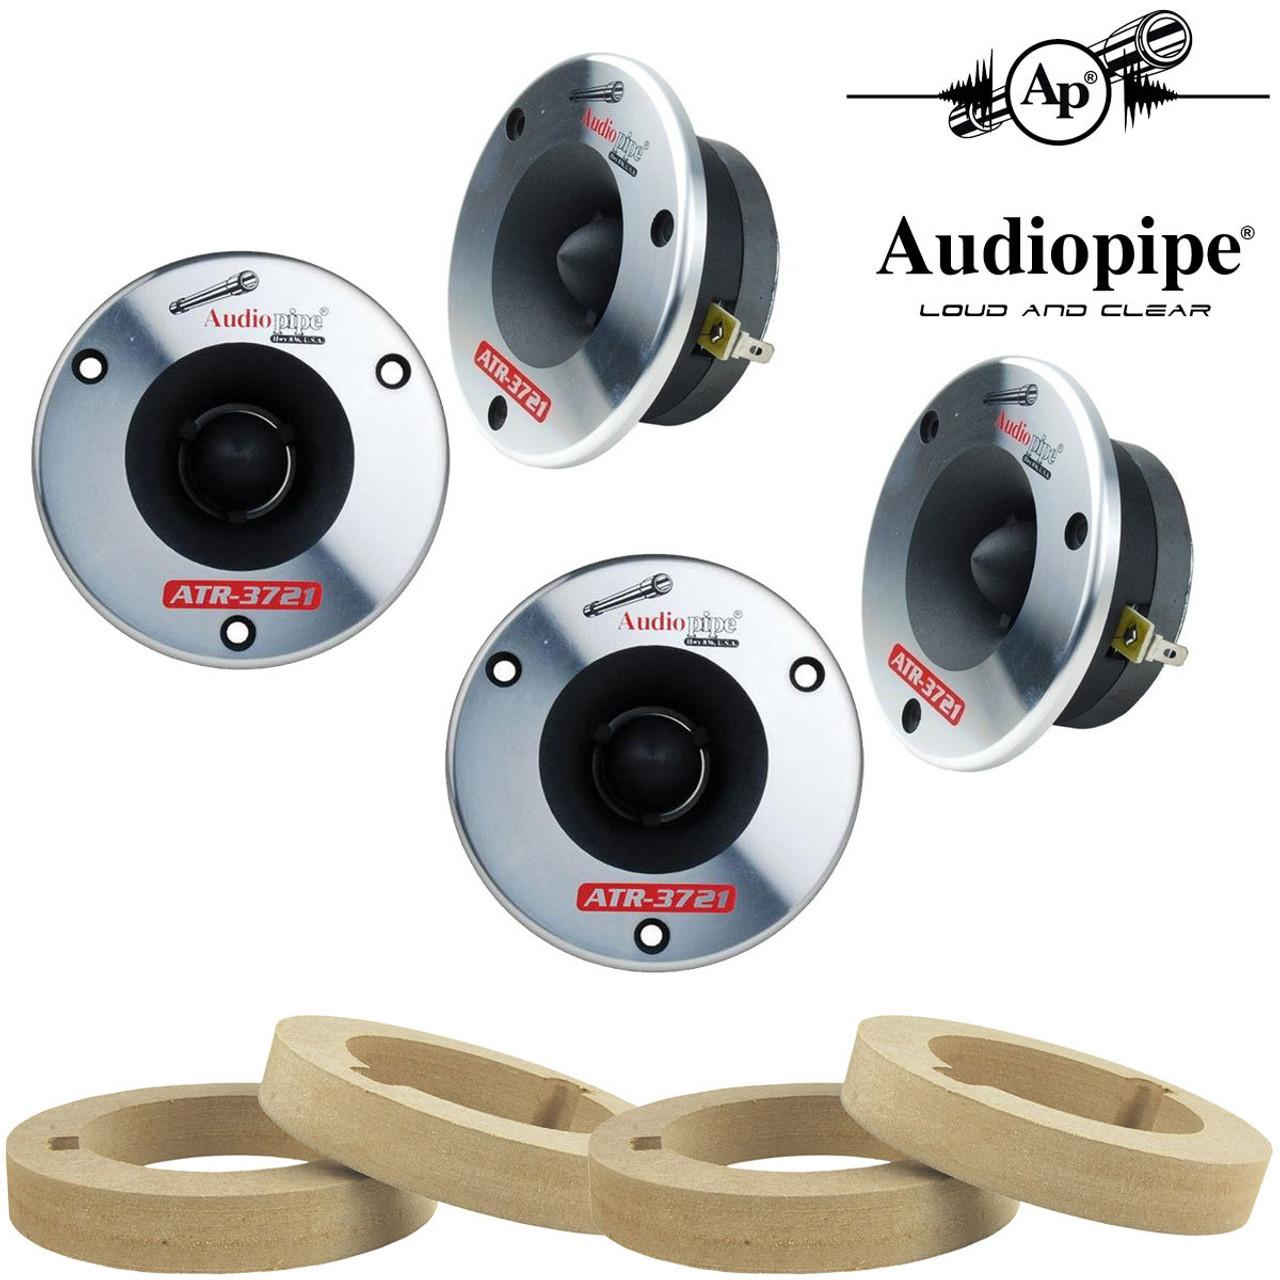 Custom MDF Tweeter Adapter Rings 2.91 ID x 4.33 OD Car Audio Installation 1 Pair